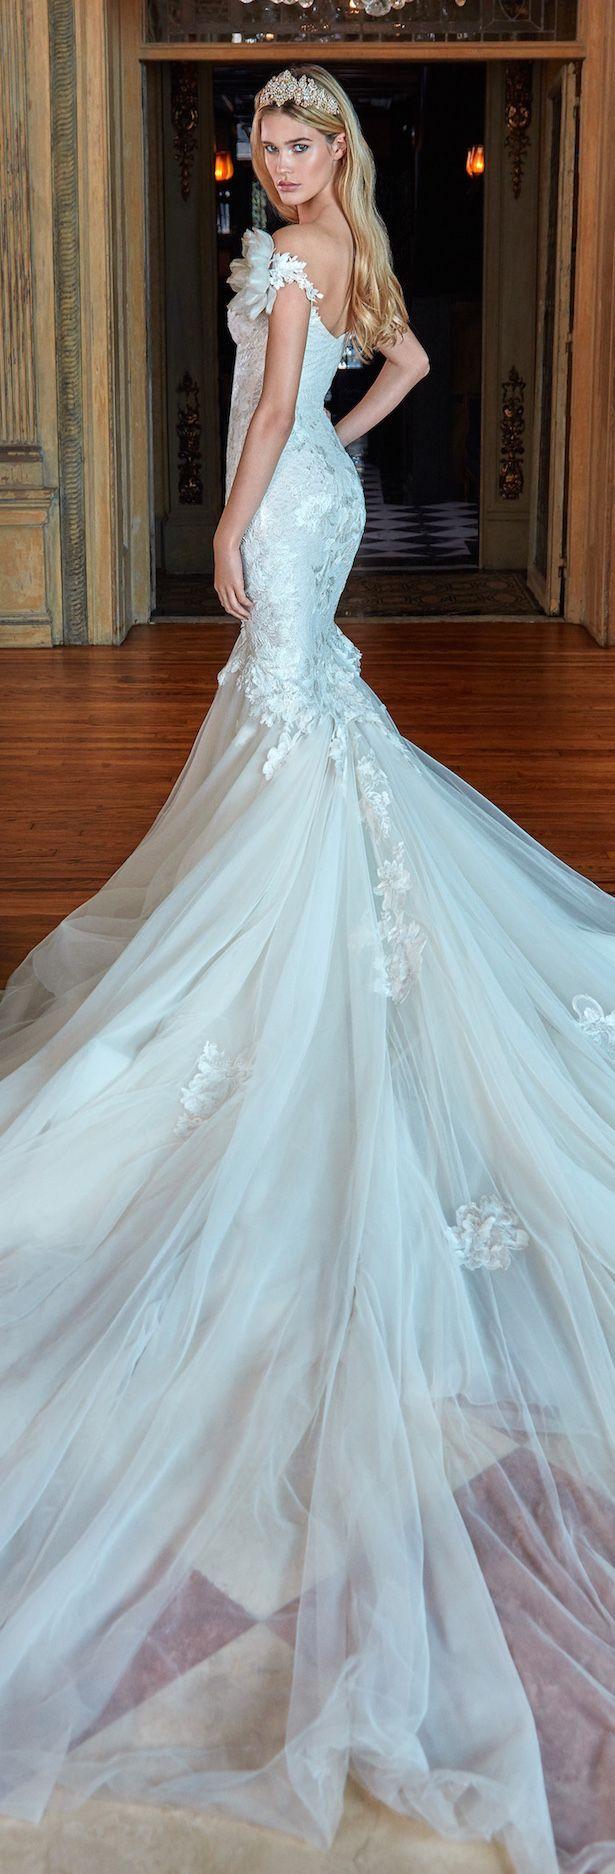 Beautiful Princess Diaries Wedding Gown Gallery - Womens Dresses ...